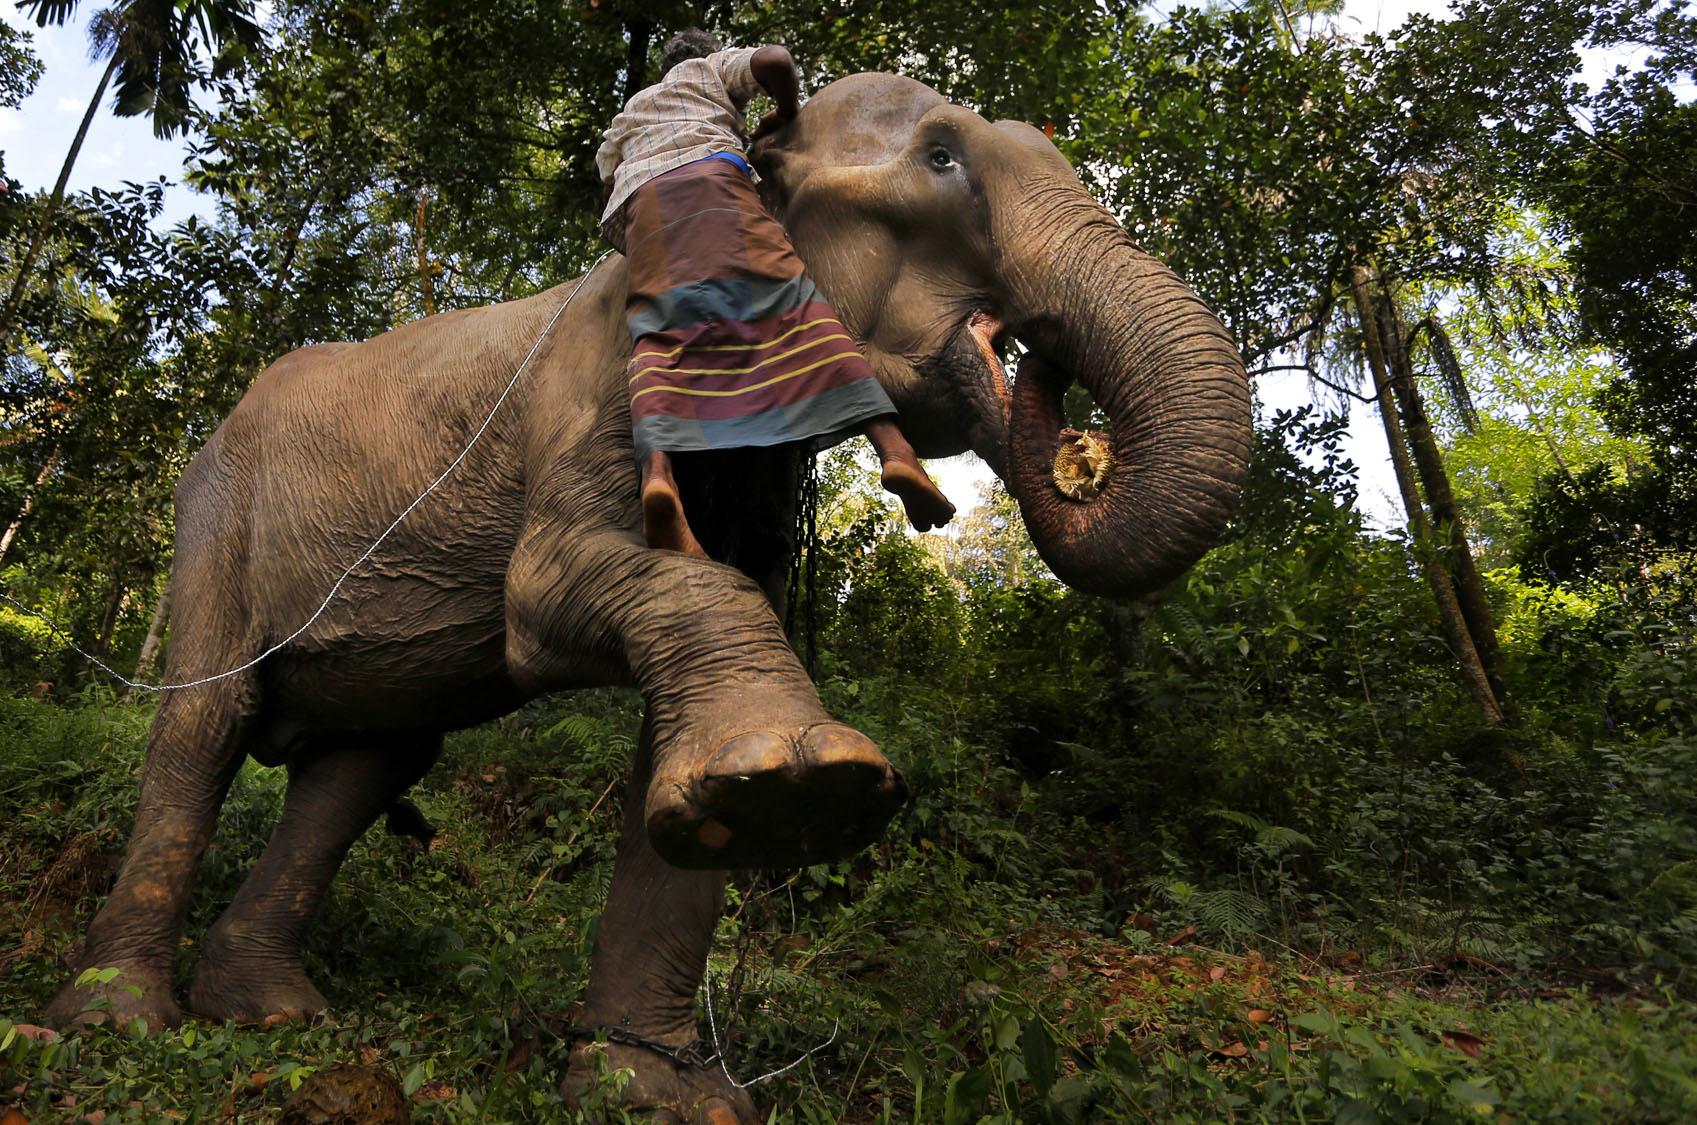 Sri Lanka cracks down on illegal elephant ownership